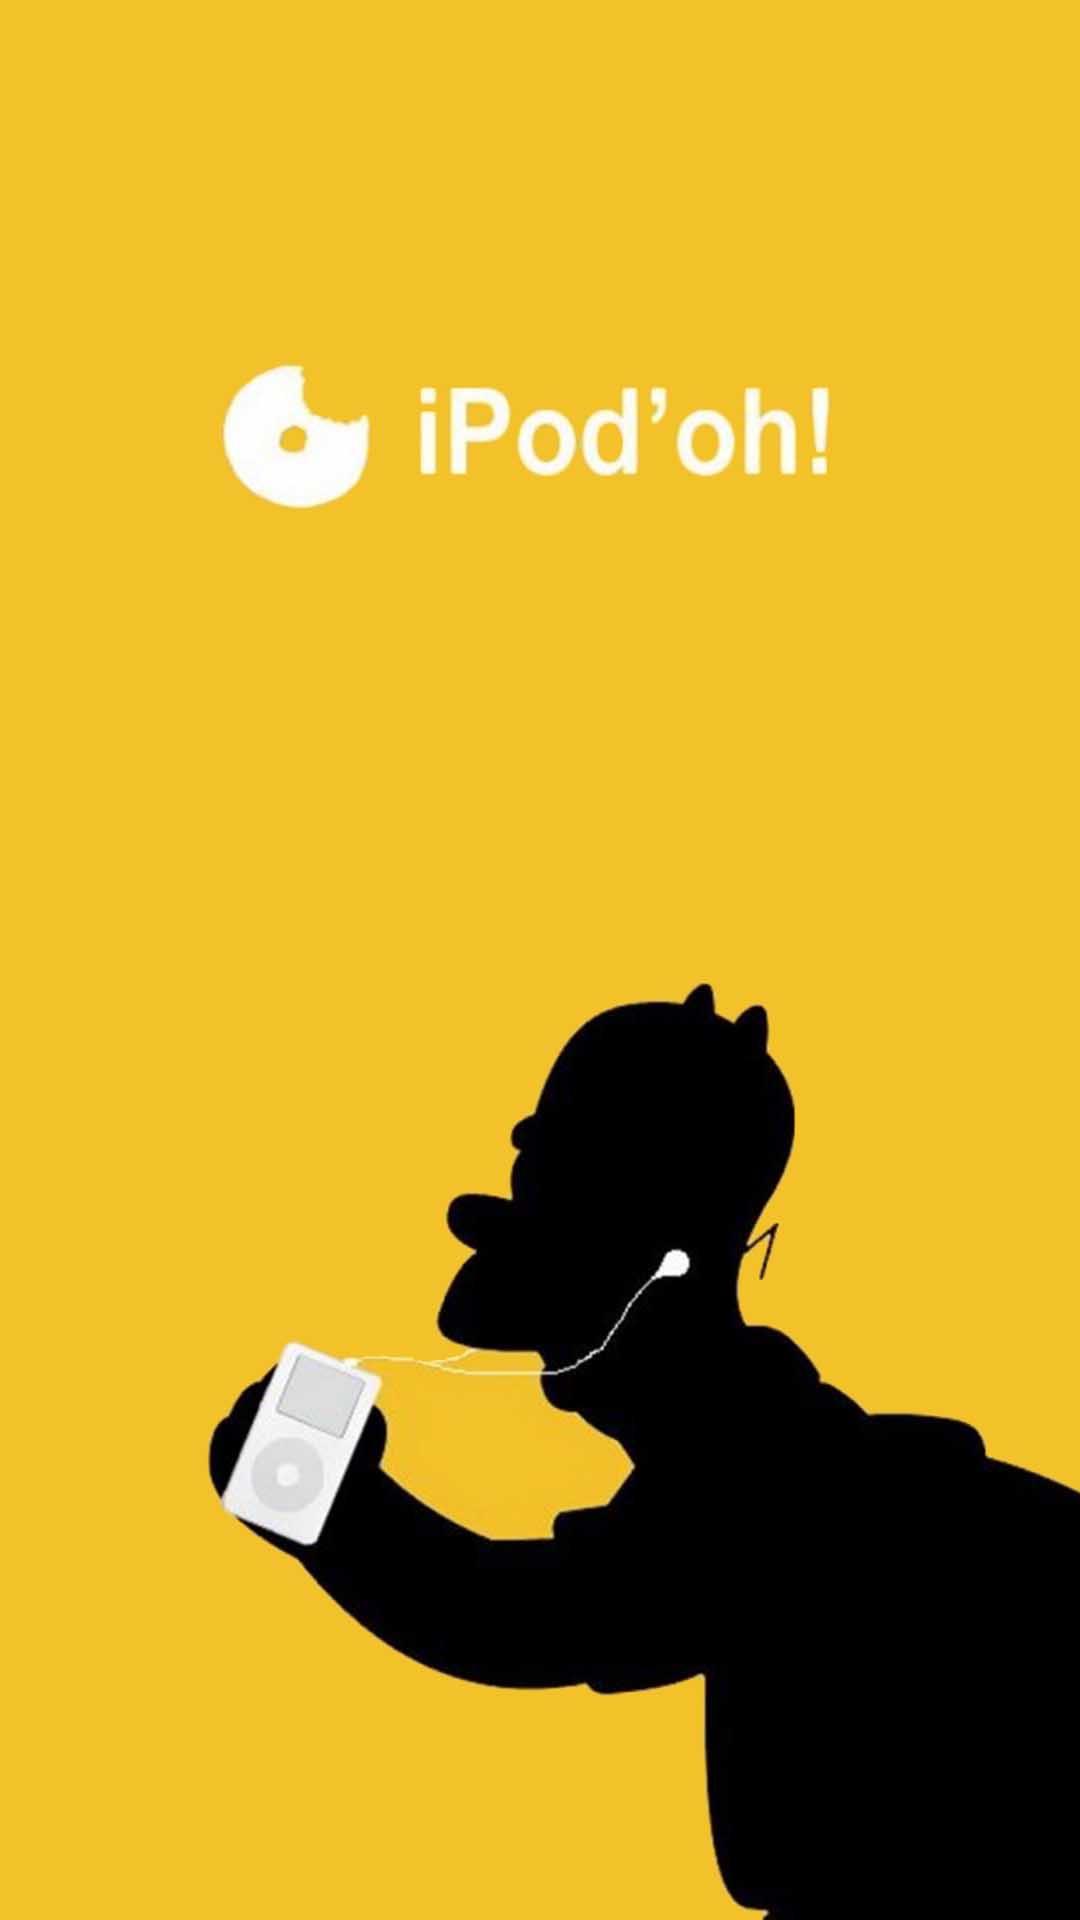 iPhone wallpaper homer simpson ipod Homer Simpson